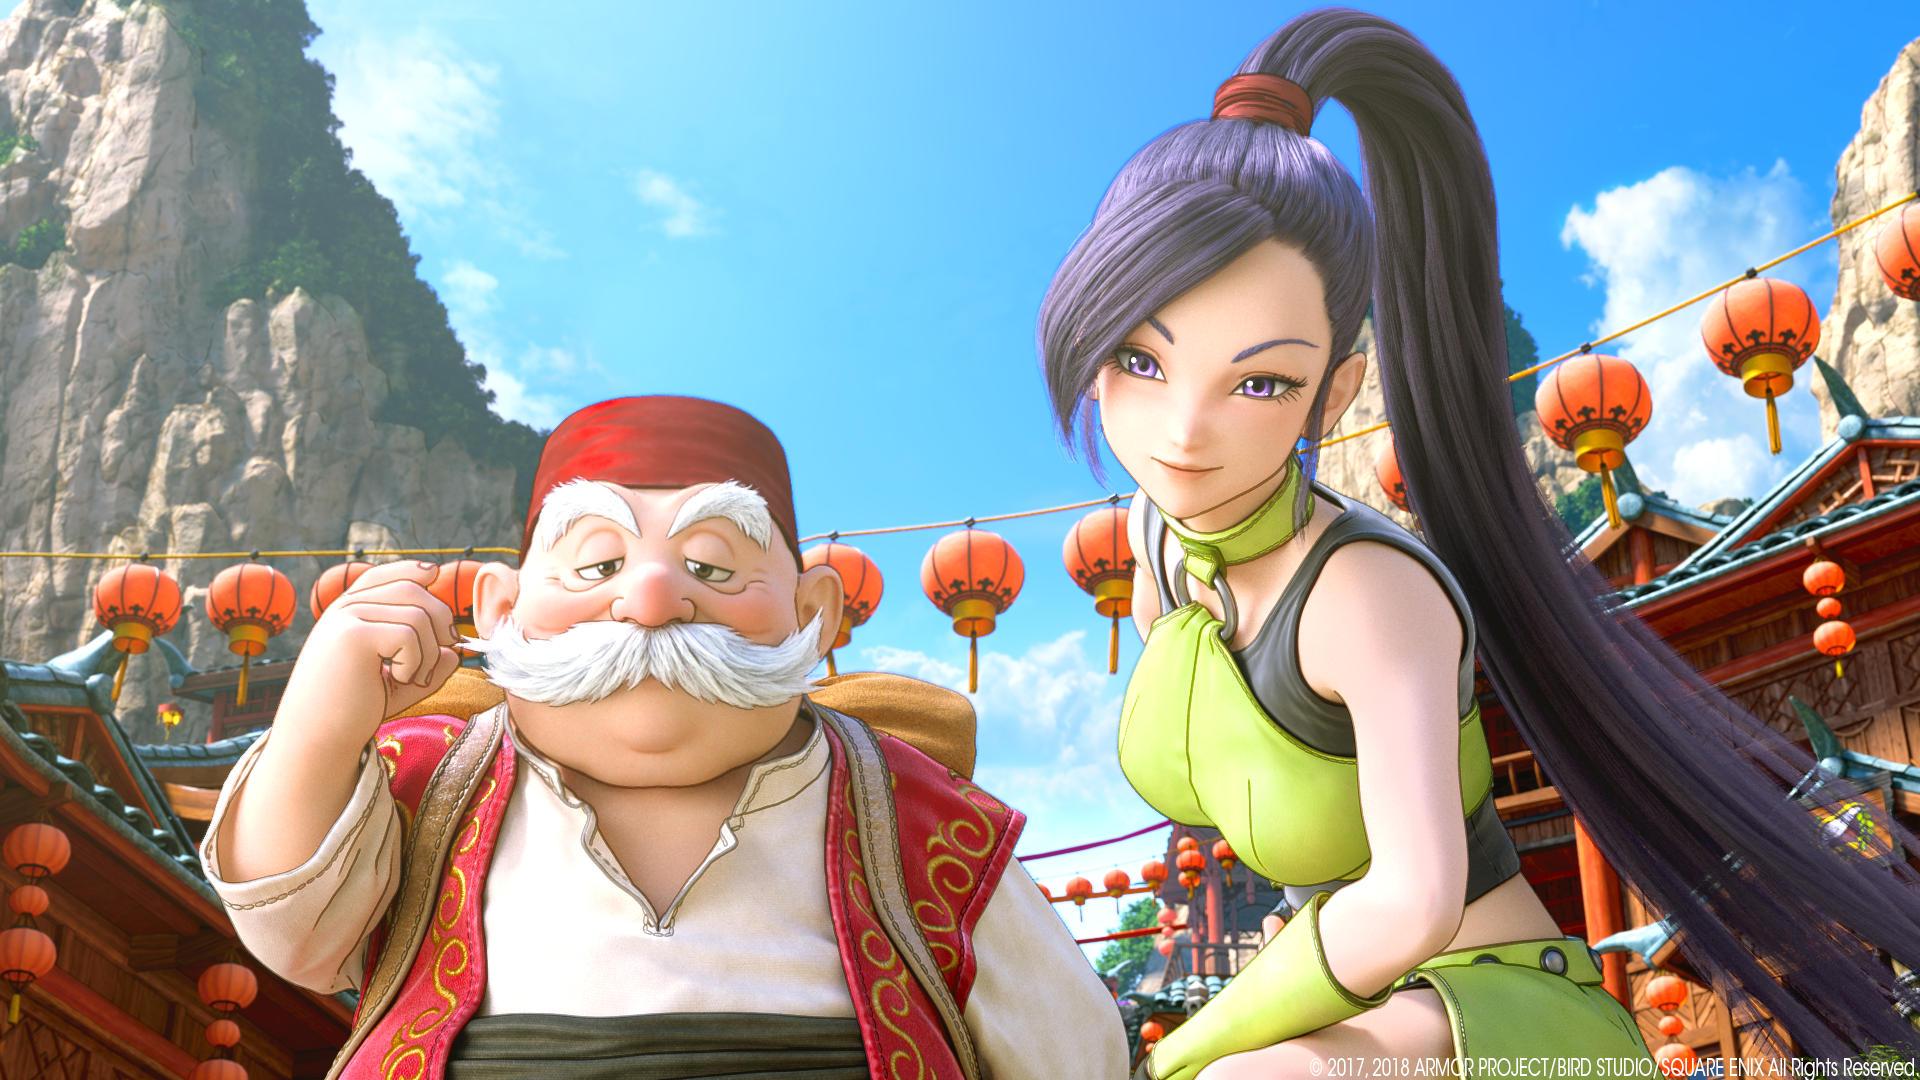 dragon-quest-xi-echoes-of-an-elusive-age-pc-screenshot-3